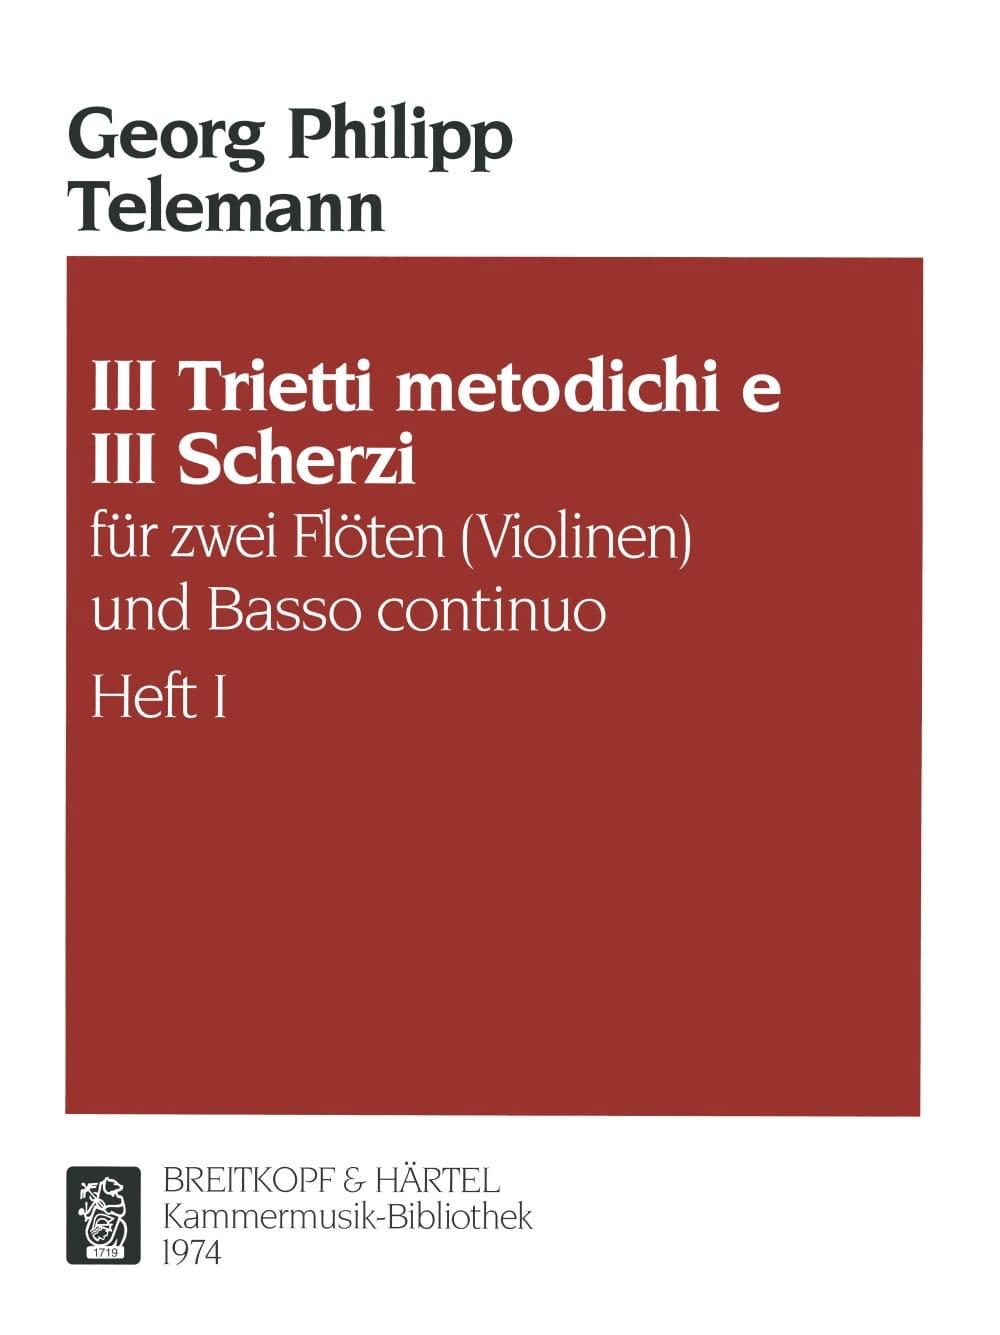 3 Trietti metodichi e Scherzi - Heft 1 -2 Flöten Violinen Bc - laflutedepan.com